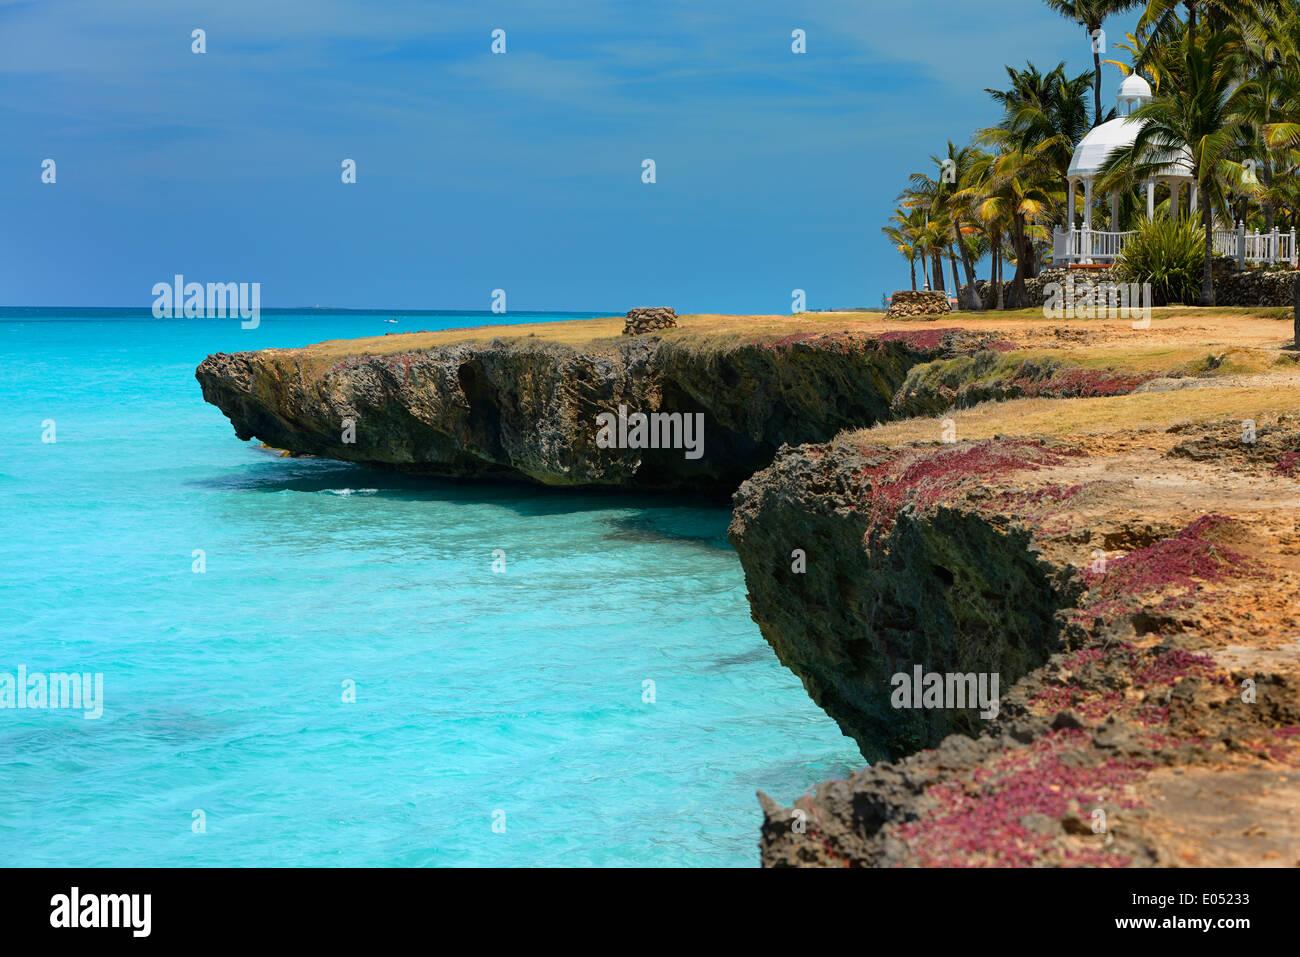 Lava Rock Ufer mit Blow Hole Brunnen, Palmen und Pavillon in Varadero Kuba Resort mit türkisfarbenen Meer Stockbild